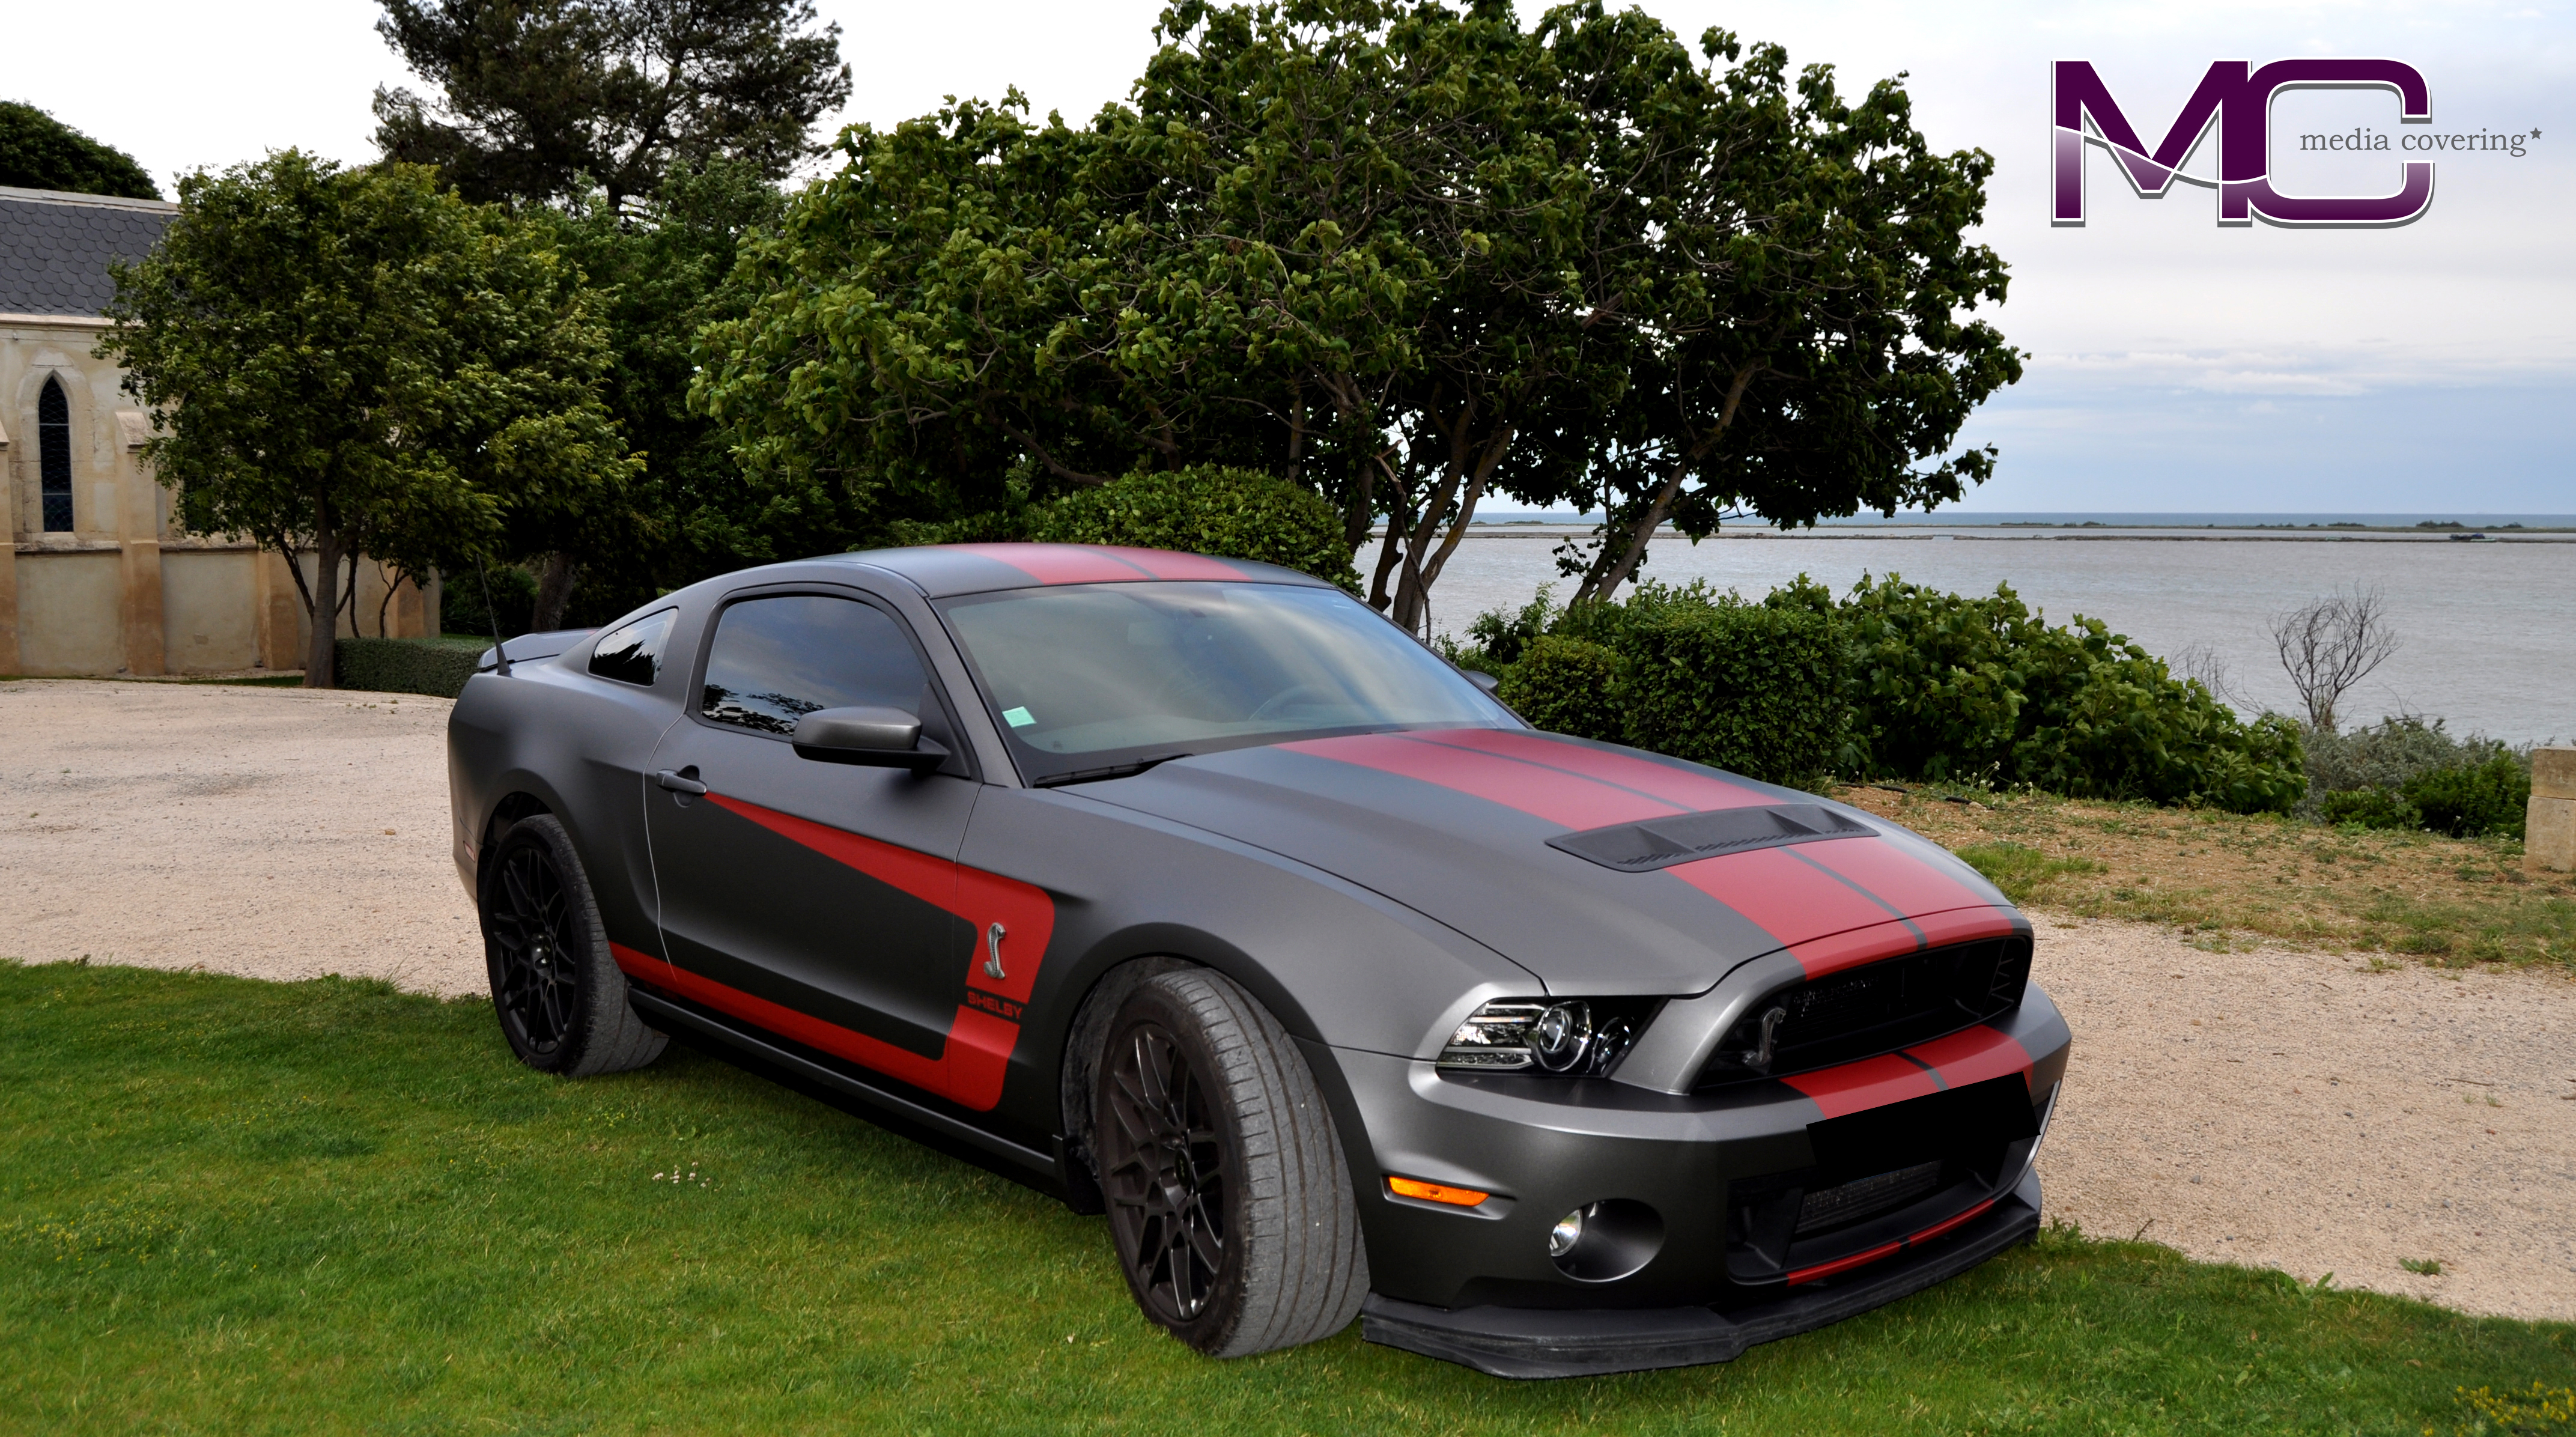 Mustang avant + logo